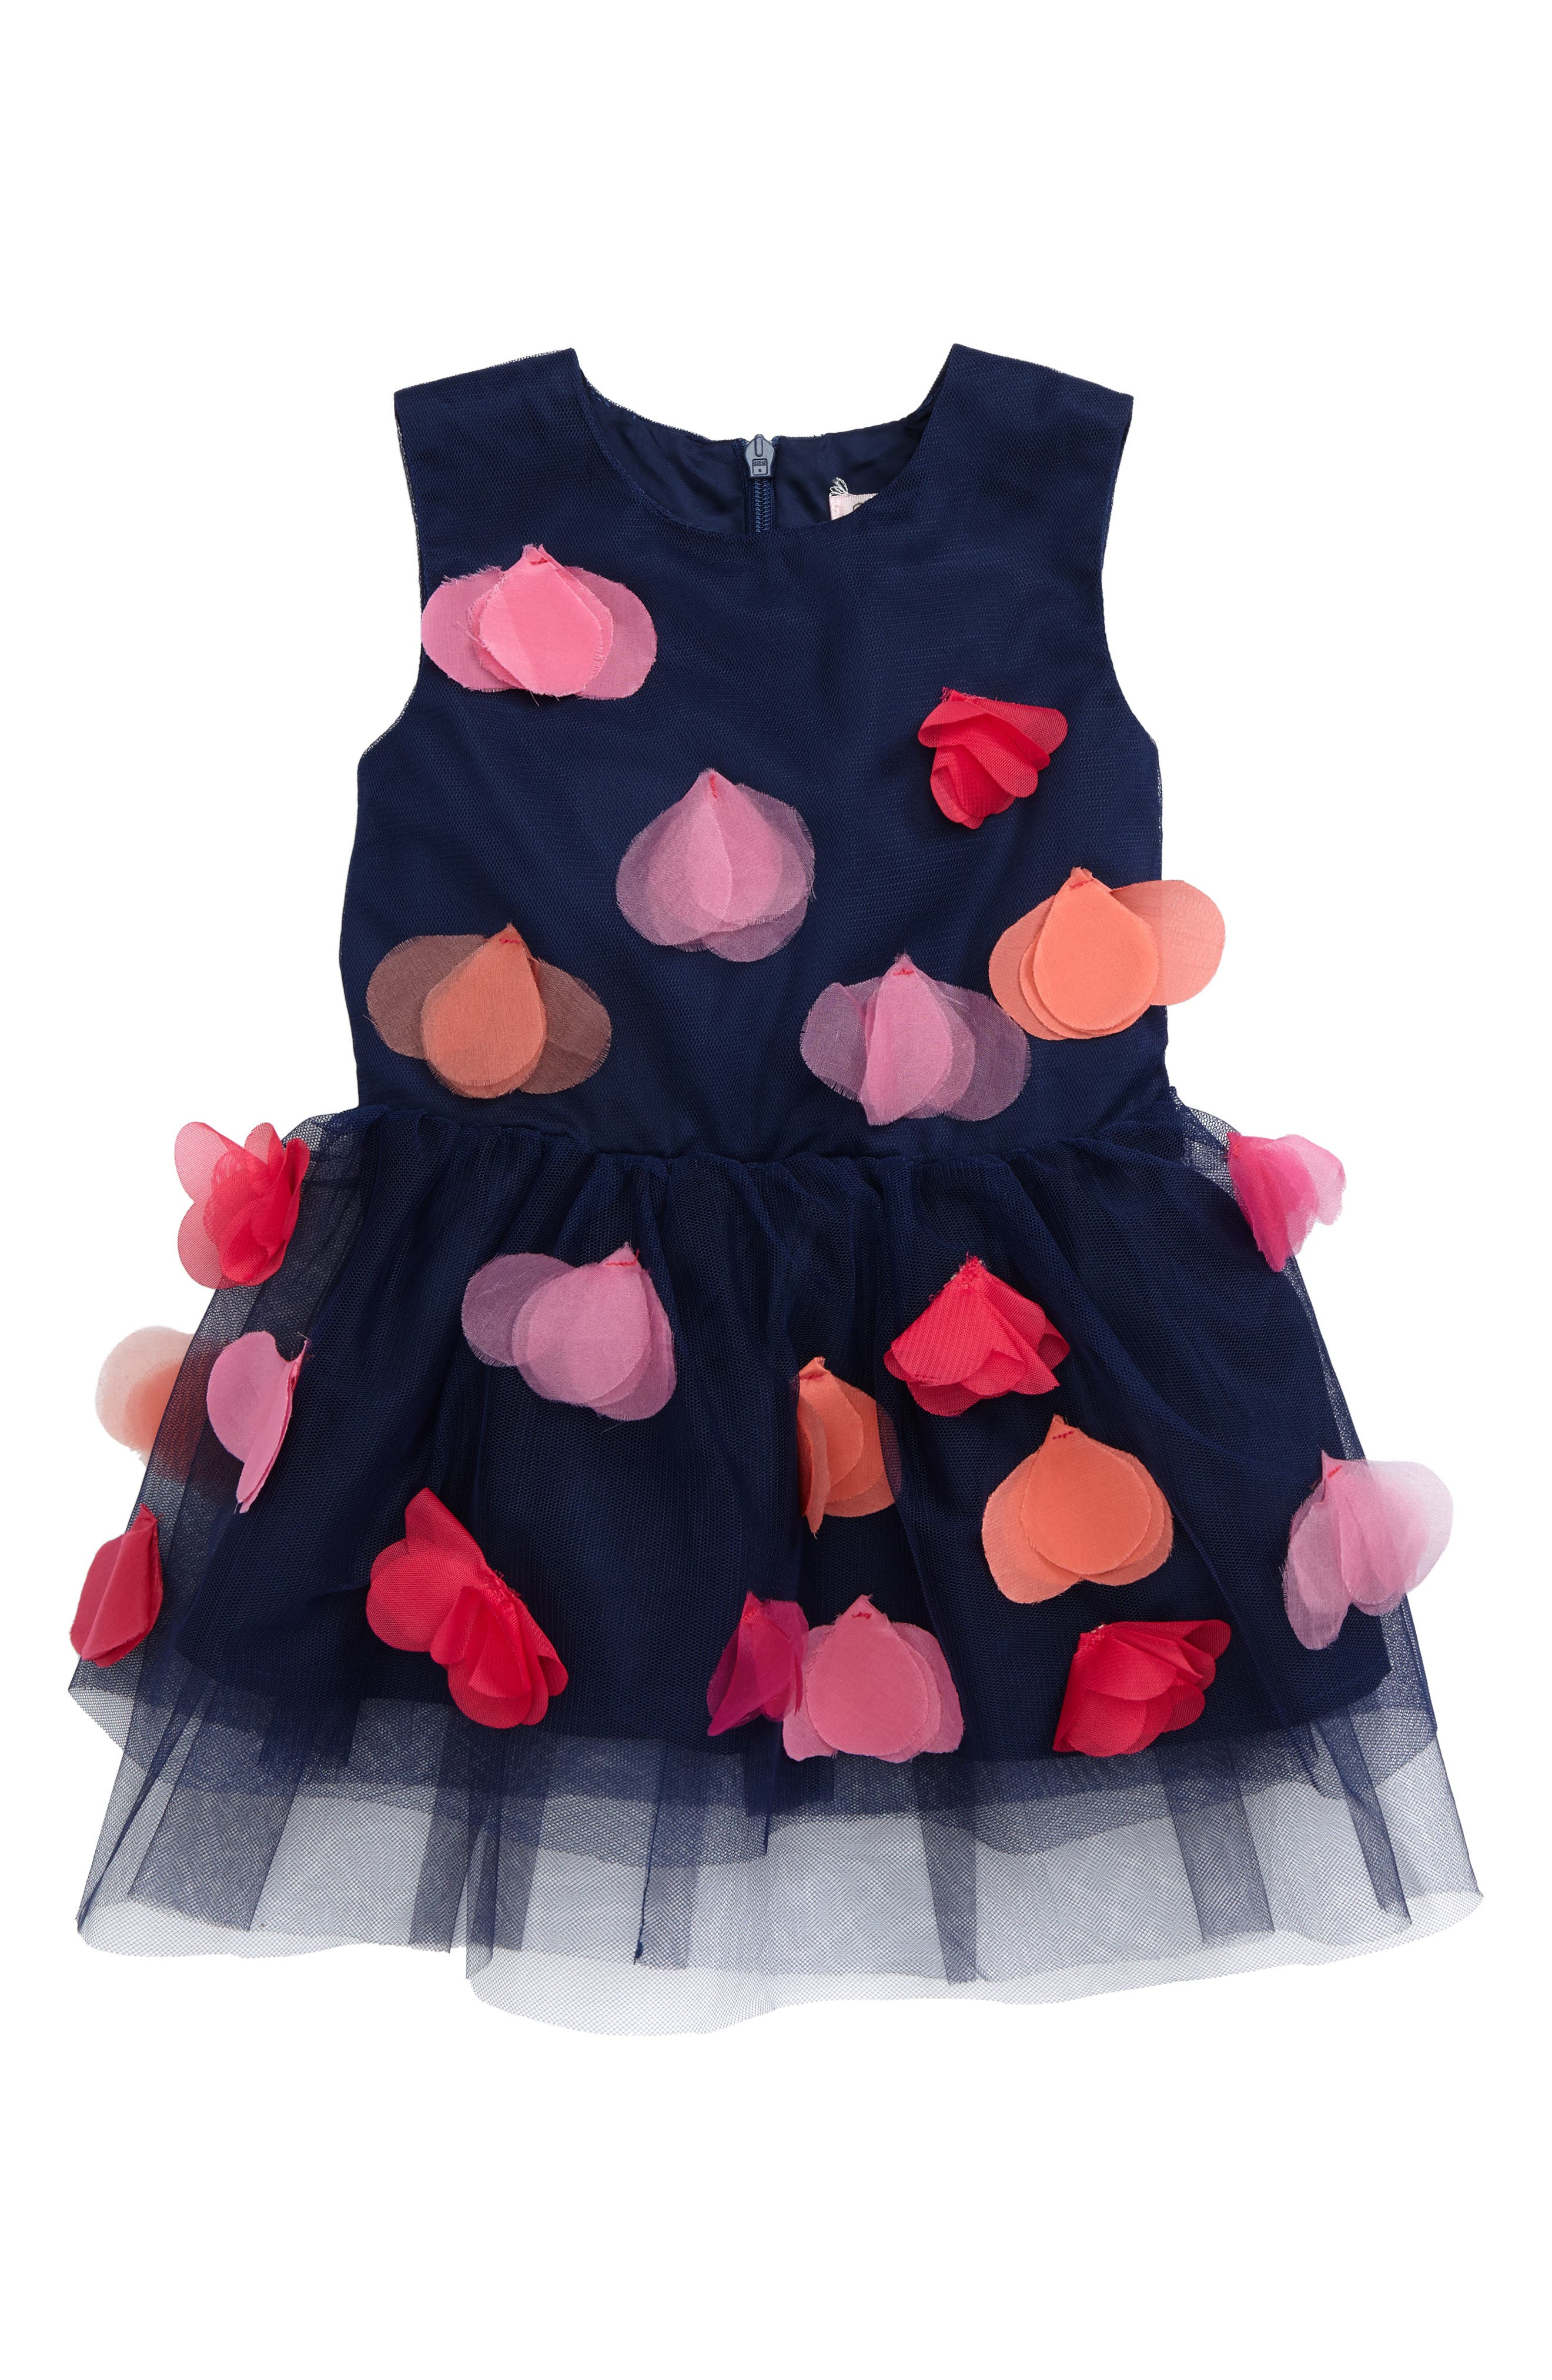 Halabaloo Aloha Flower Appliqué Dress (Baby Girls)